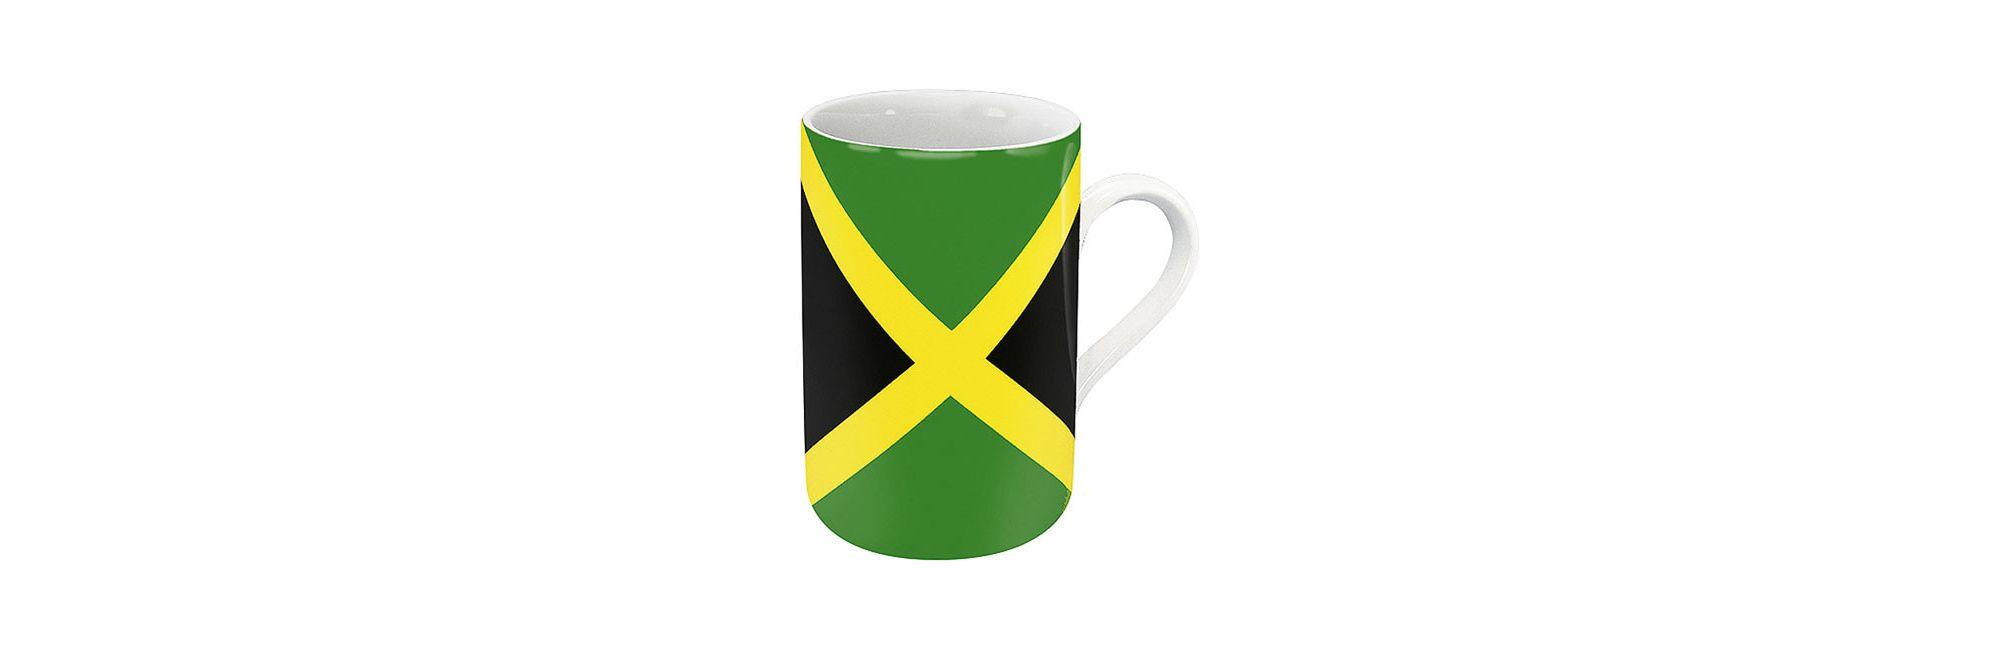 K?nitz Flags and Countries Jamaica Mug (Set of 4)